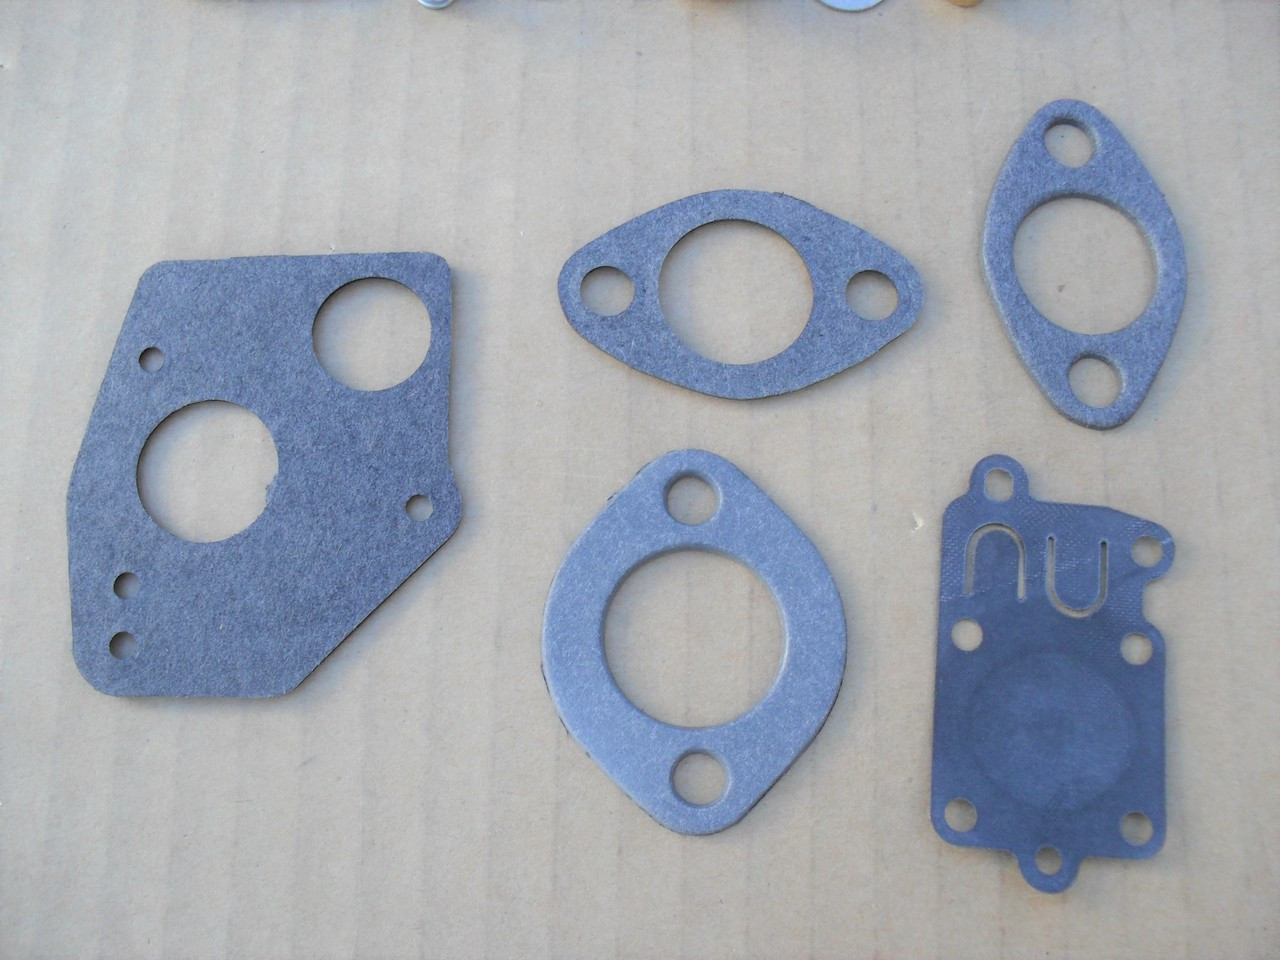 Carburetor Rebuild Kit for Briggs and Stratton 2 HP, 3 HP, Mclane 116-031, 60200, 60900, 61200, 61900, 80200, 80800, 80900, 81200, 81800, 81900, 84900, 85900, 100200, 130200, 140200, 141200, 144200, 145200